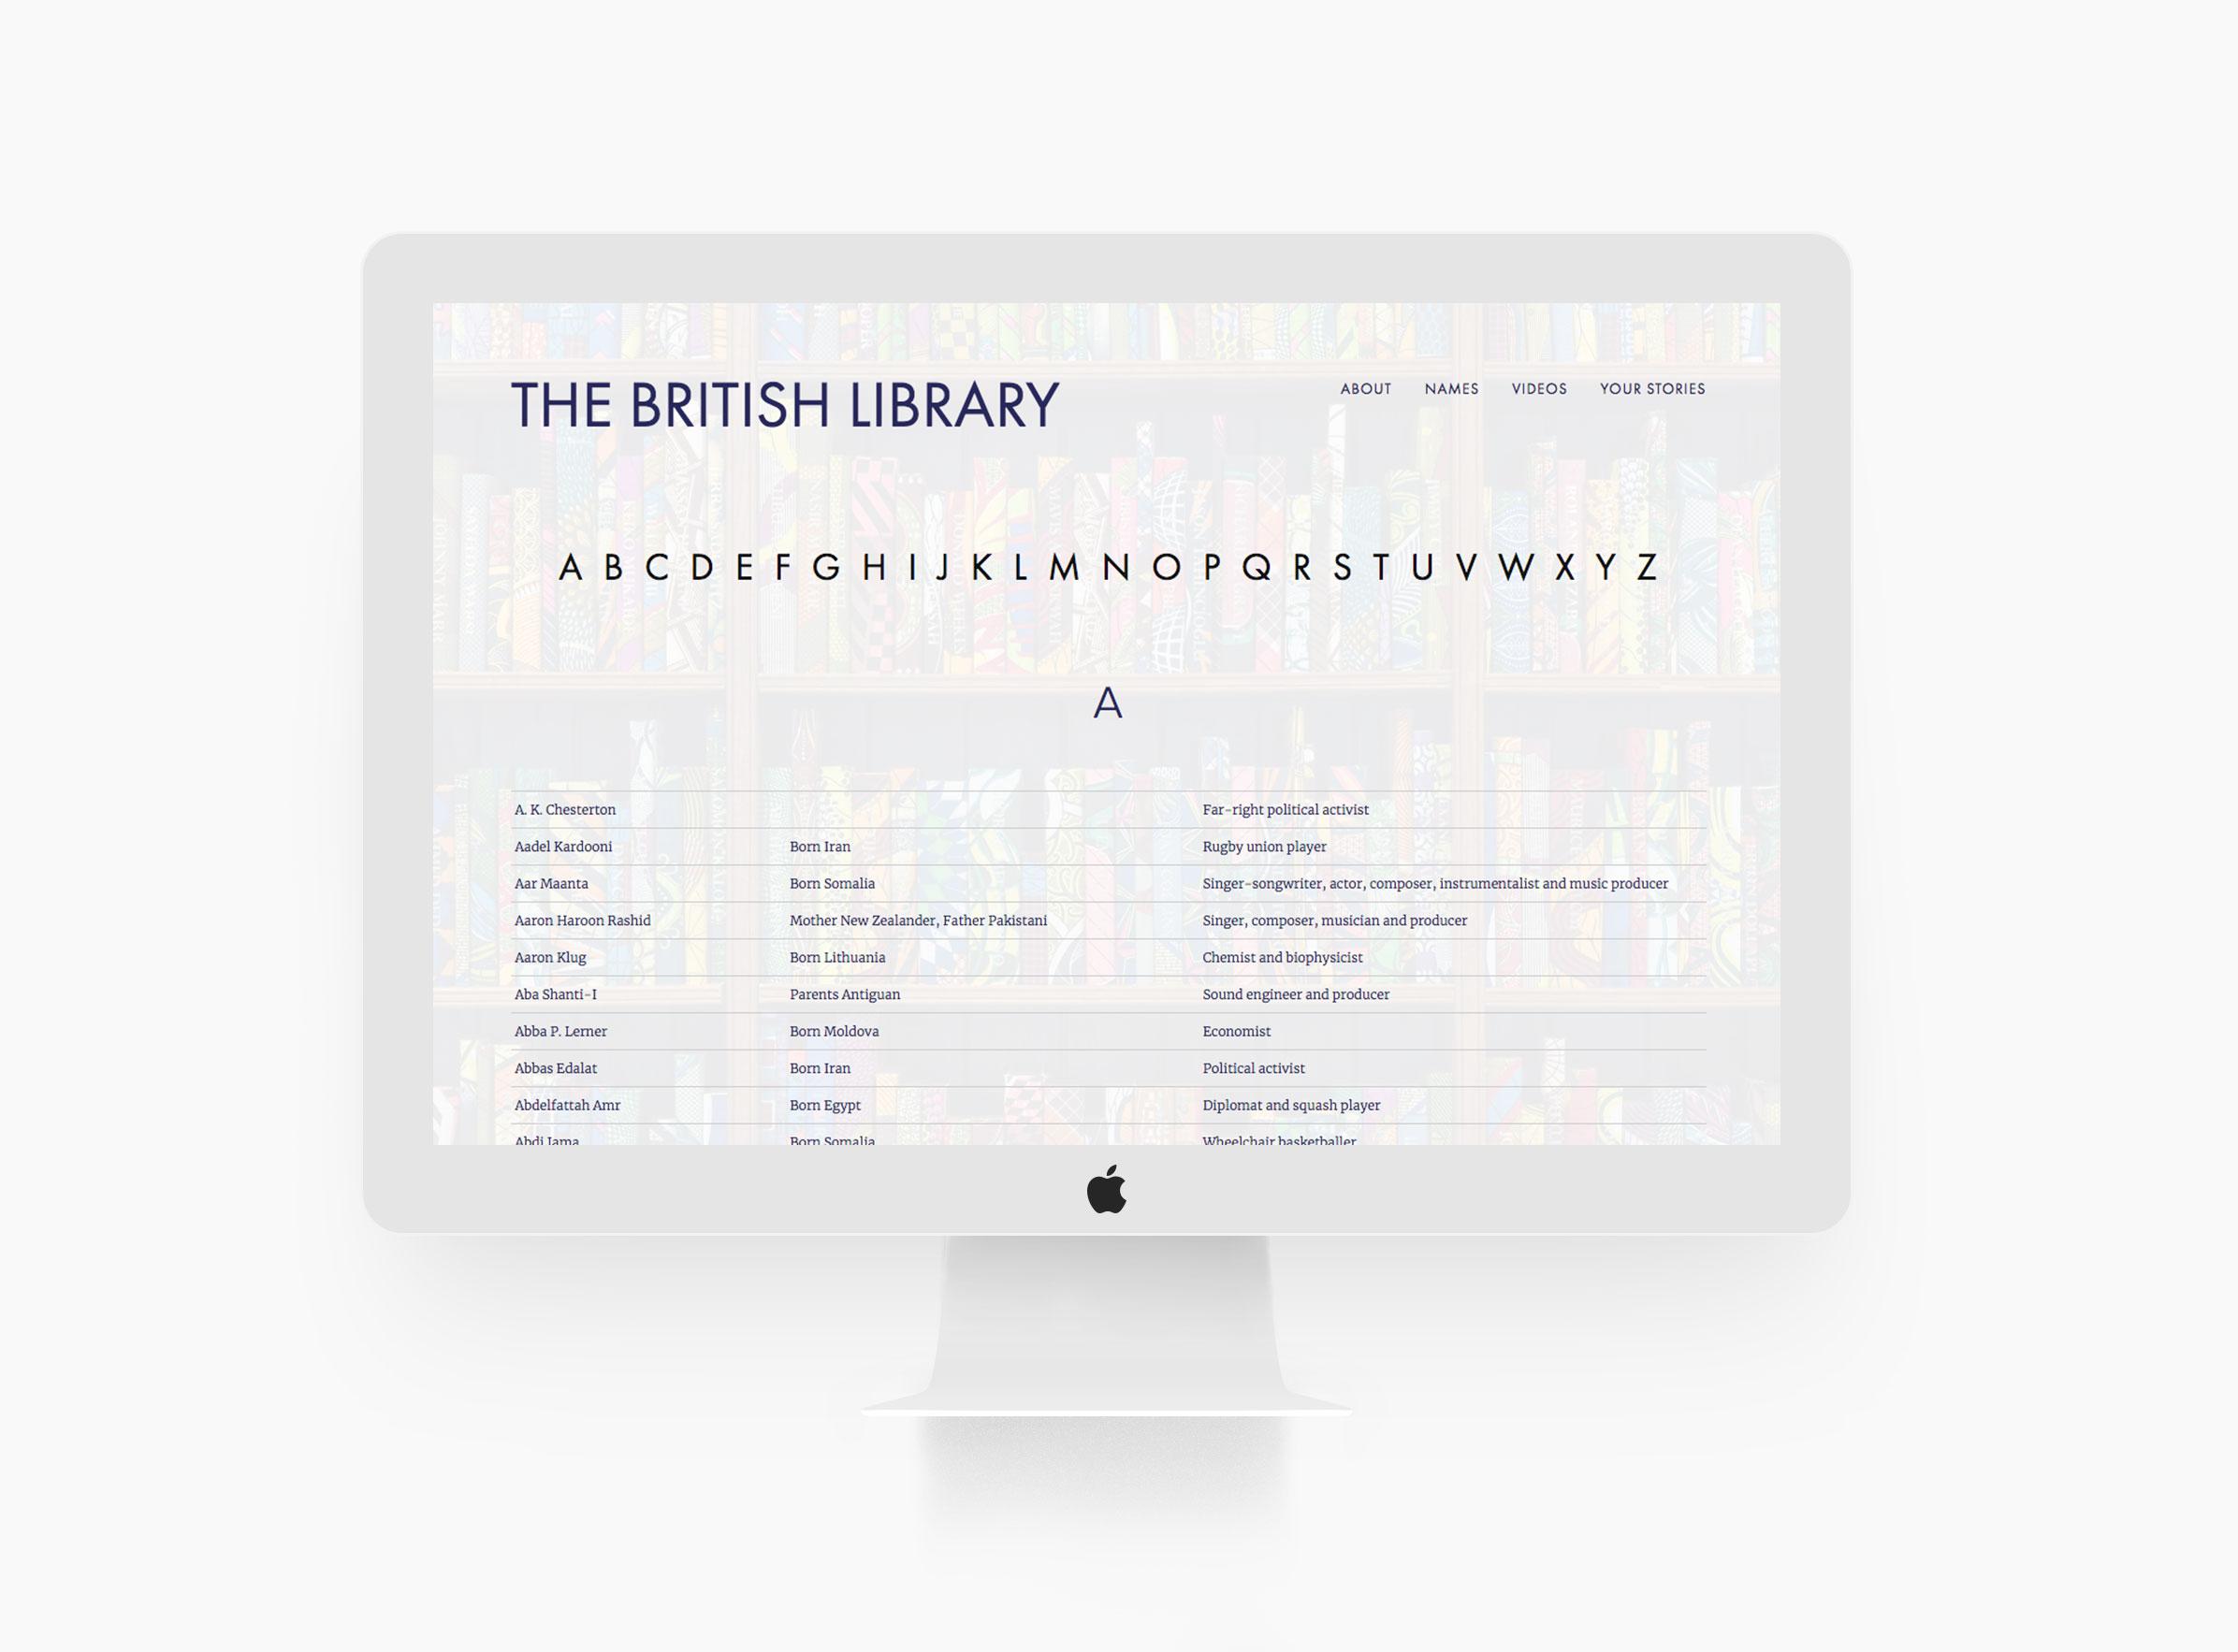 Web-Design-for-Artists-and-Creatives_Yinka-Shonibare-British-Library-List.jpg